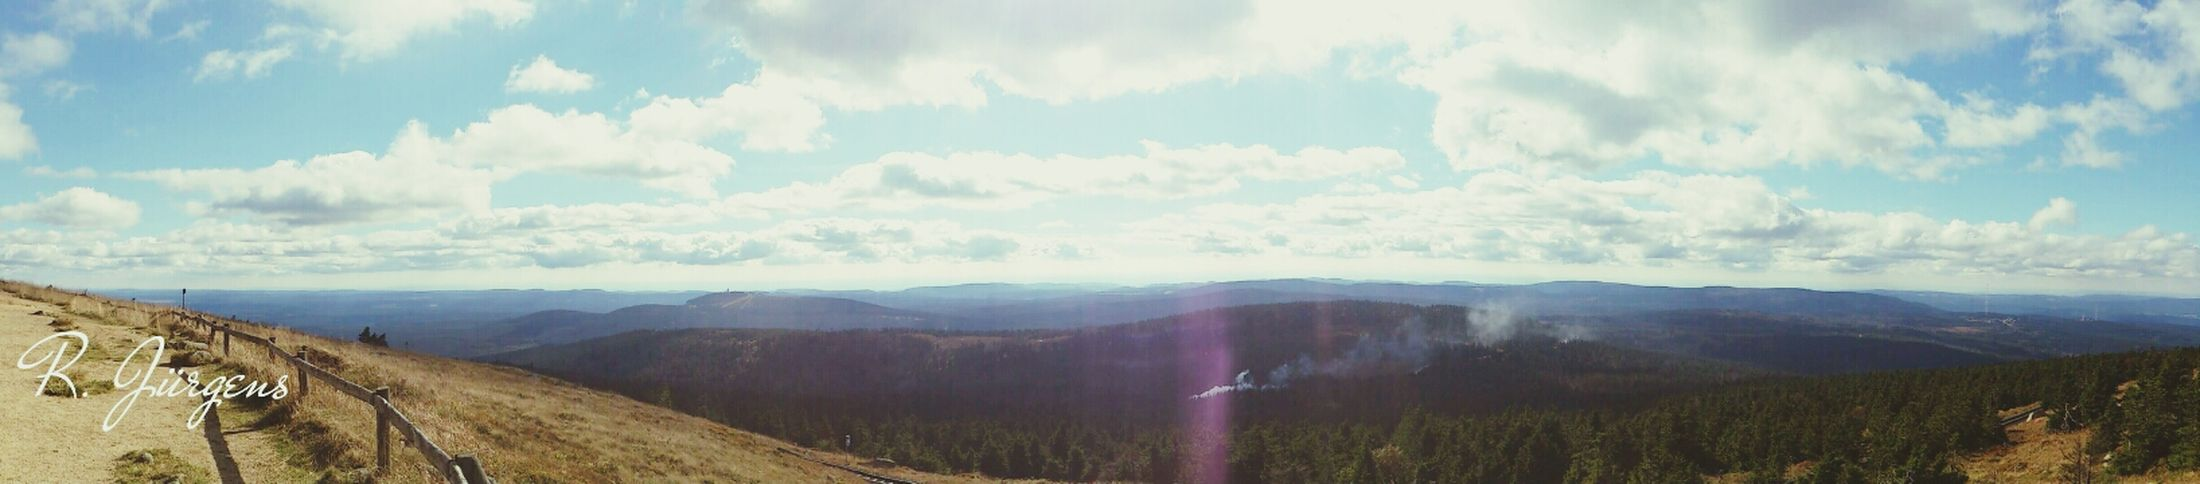 WeatherPro: Your Perfect Weather Shot EyeEm Best Shots - Landscape Panorama Landscape_Collection